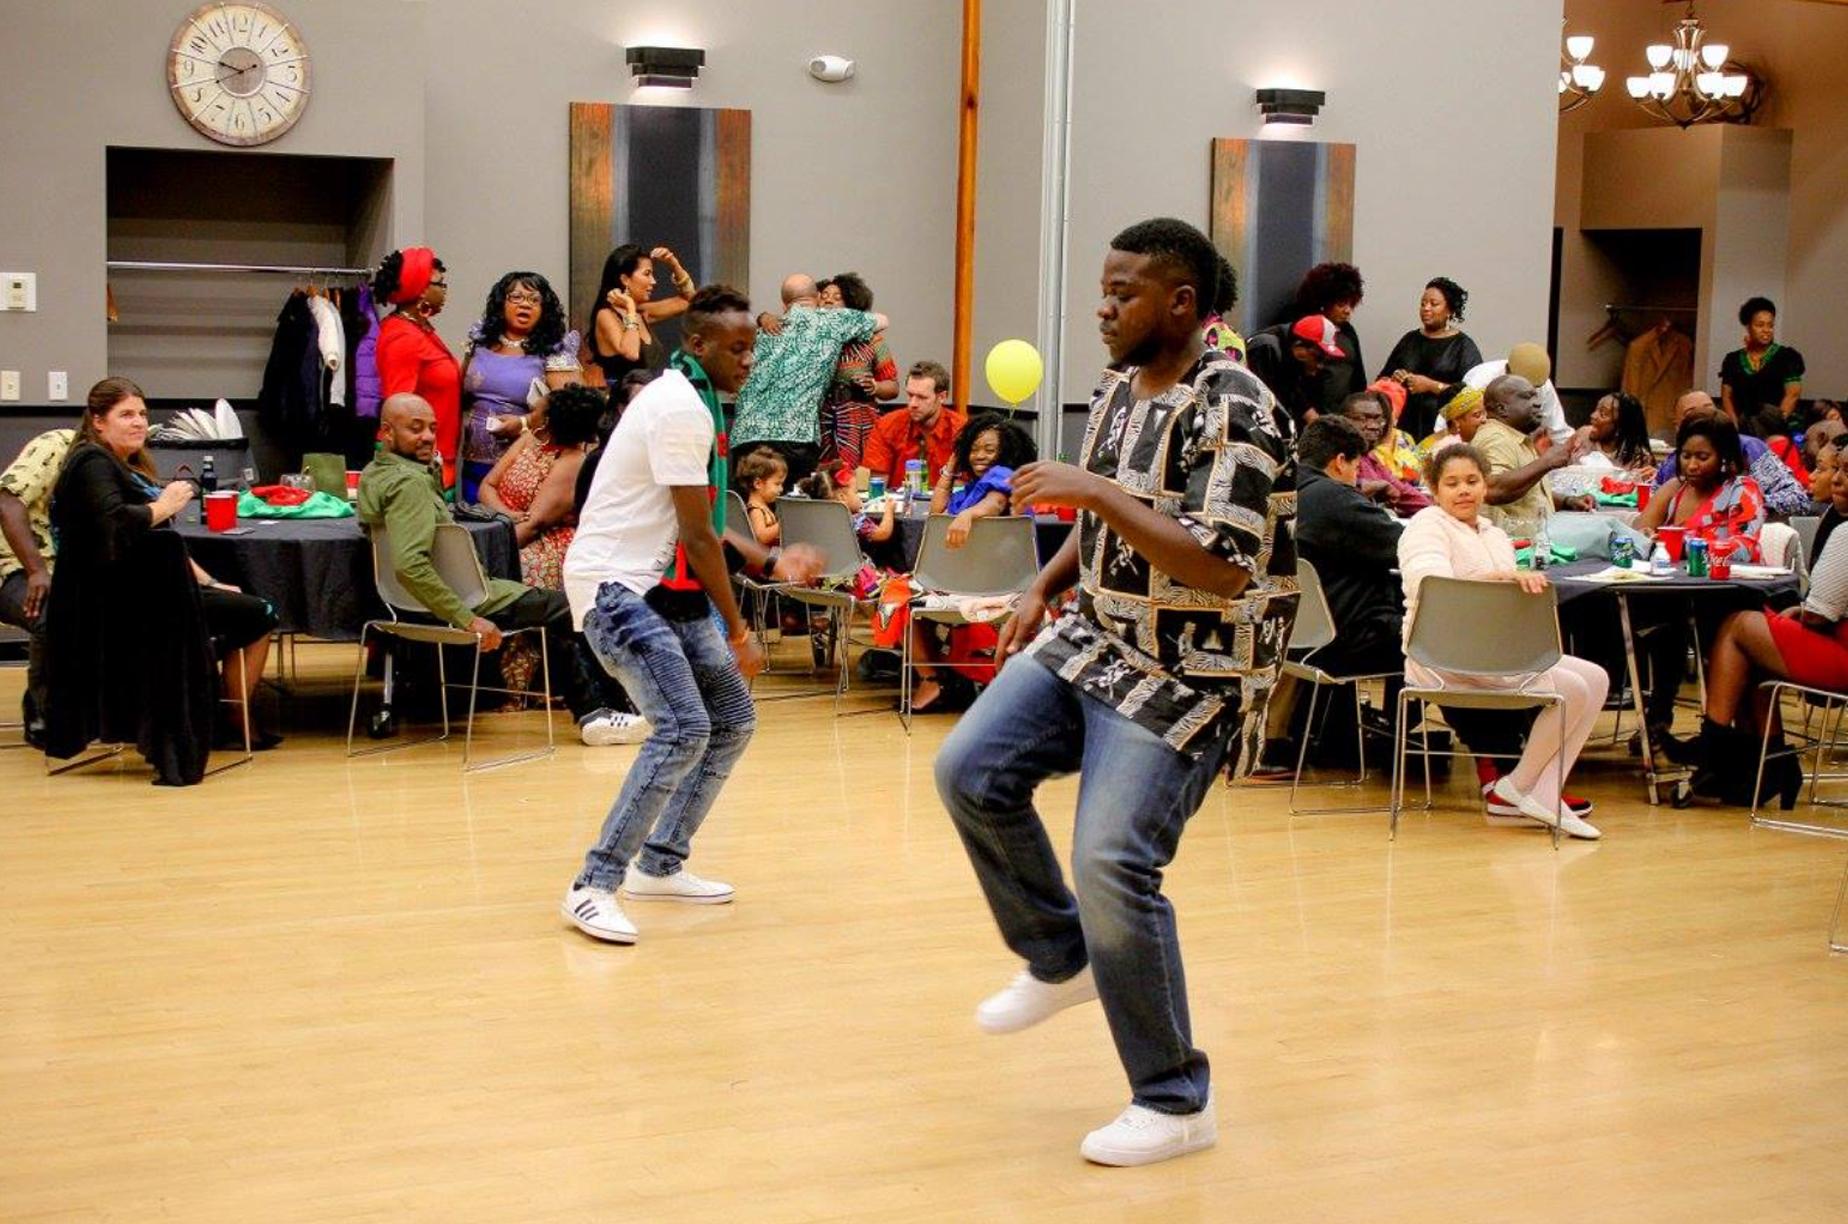 Dancers at AZISWA event